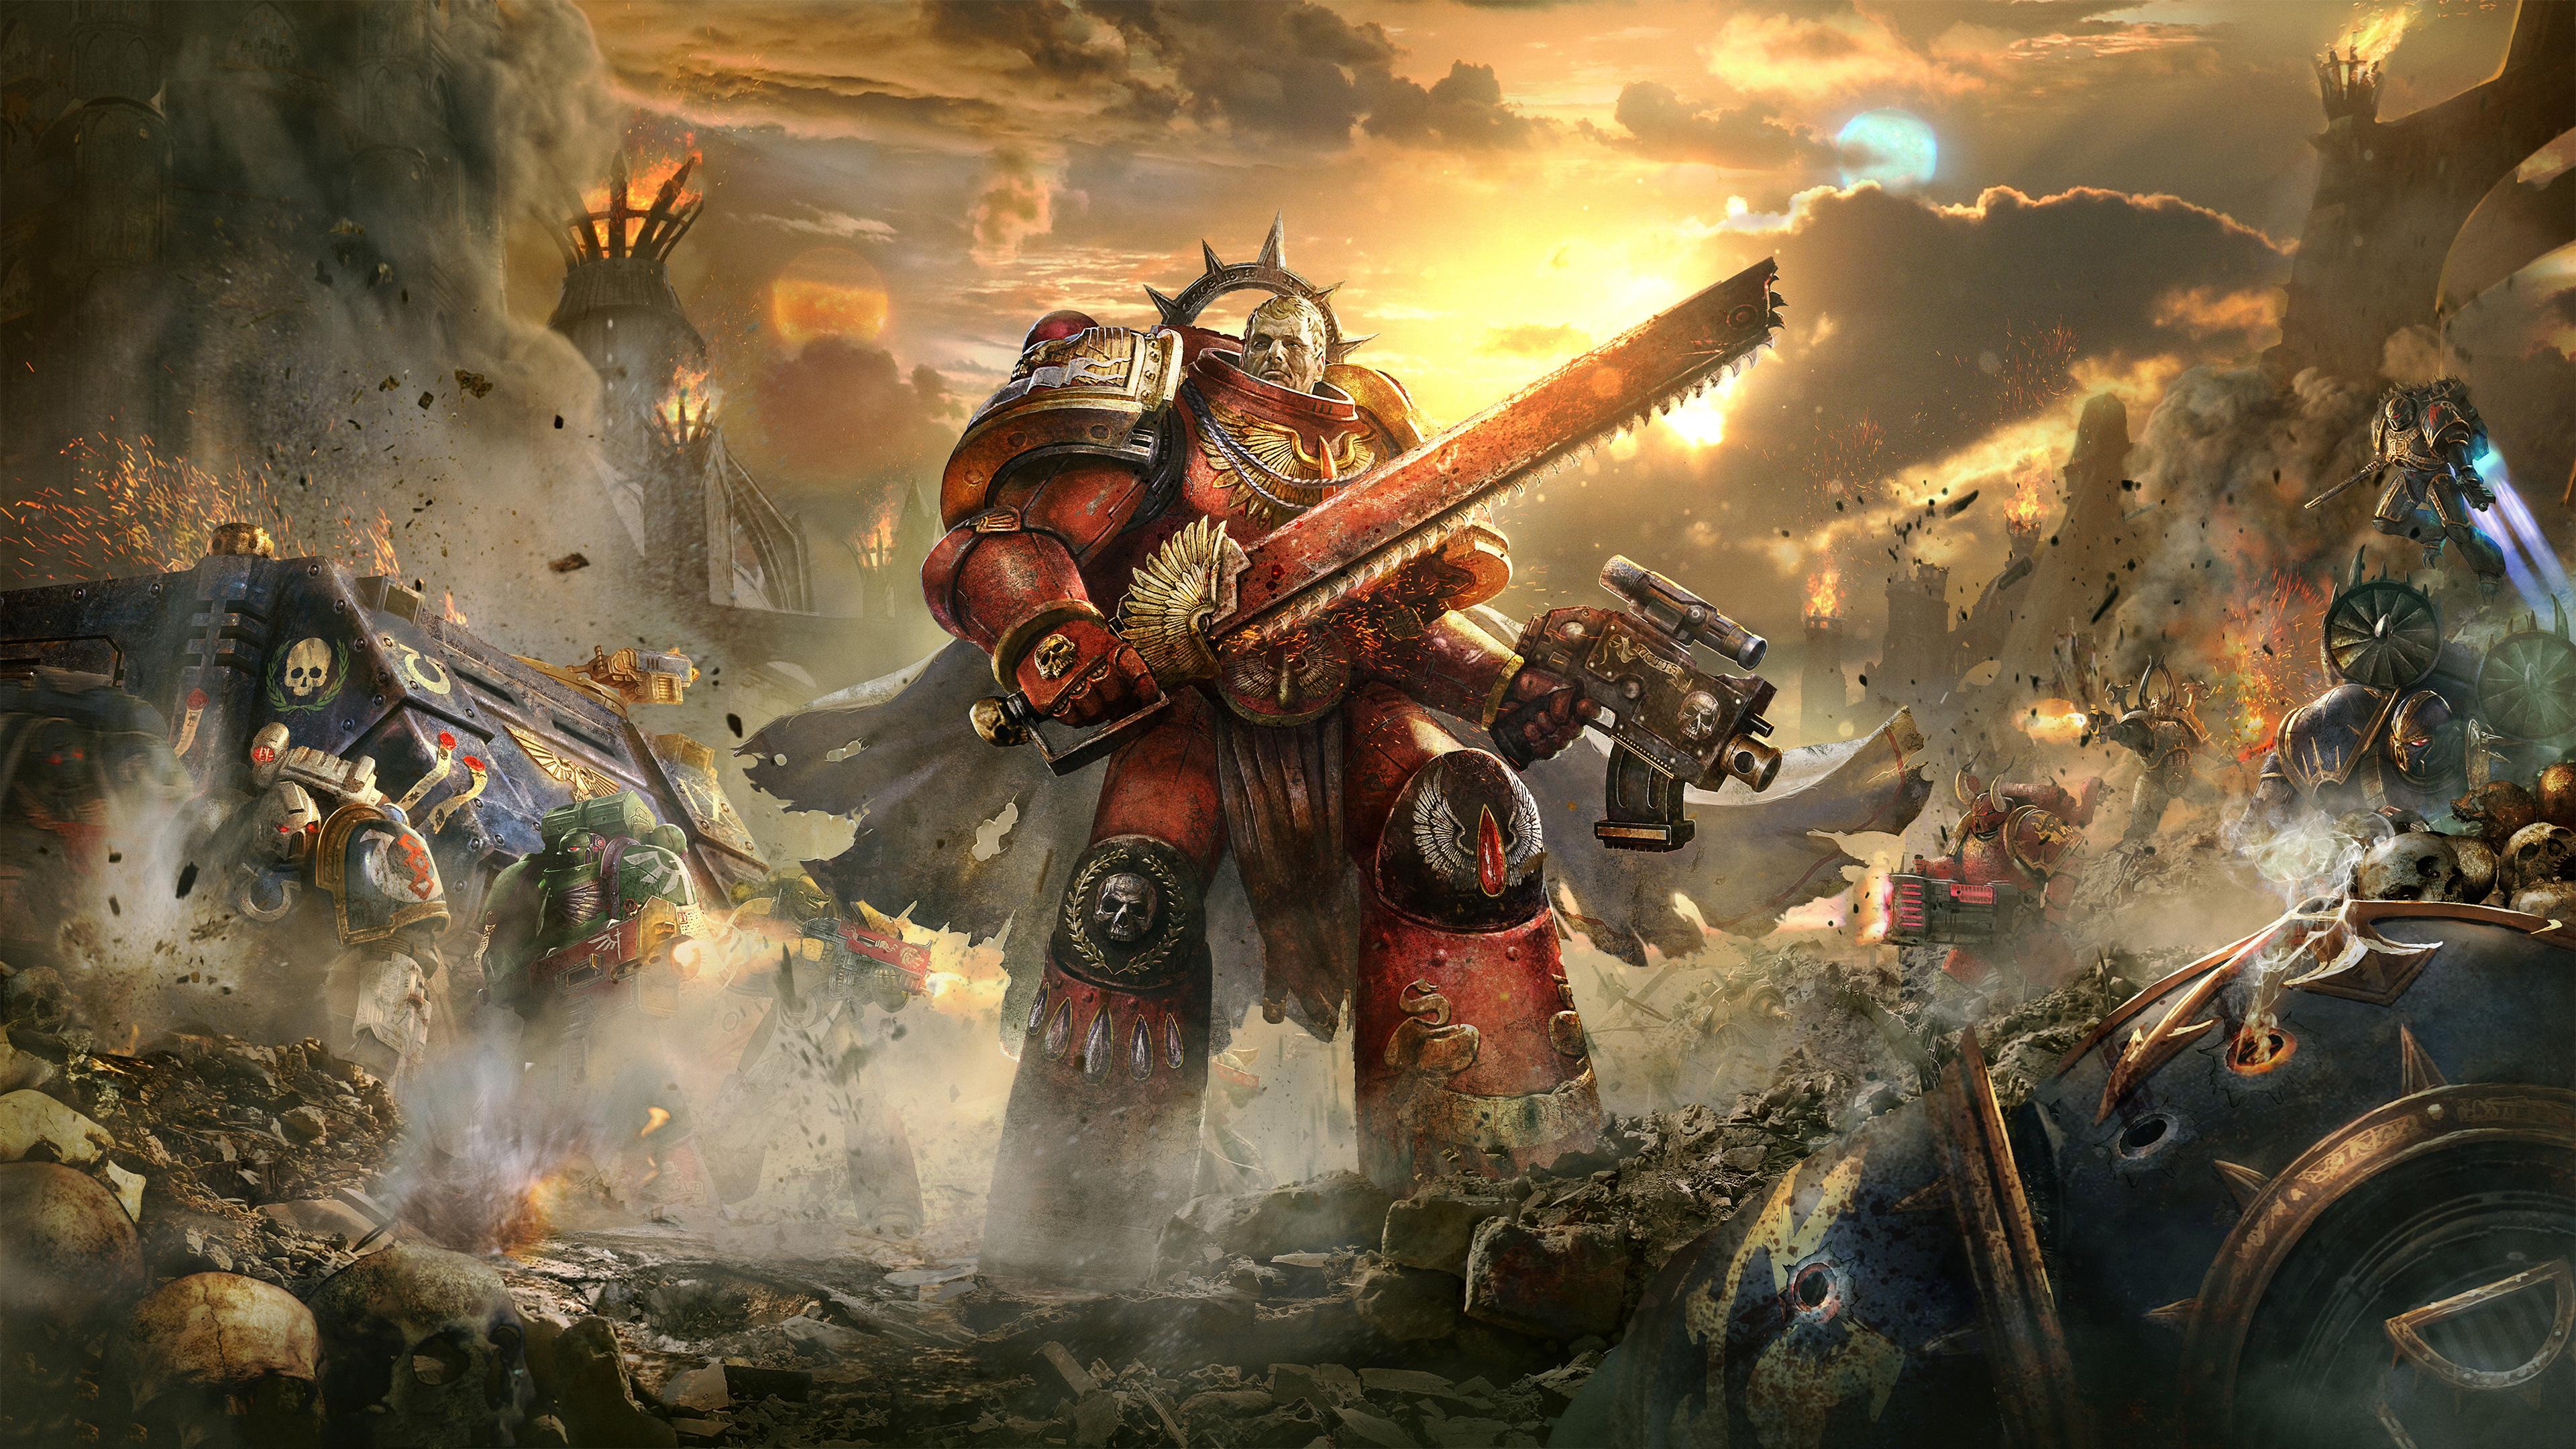 Attack On Titan Cute Wallpaper Warhammer 40000 Warhammer 40000 Dawn Of War Iii Wallpapers